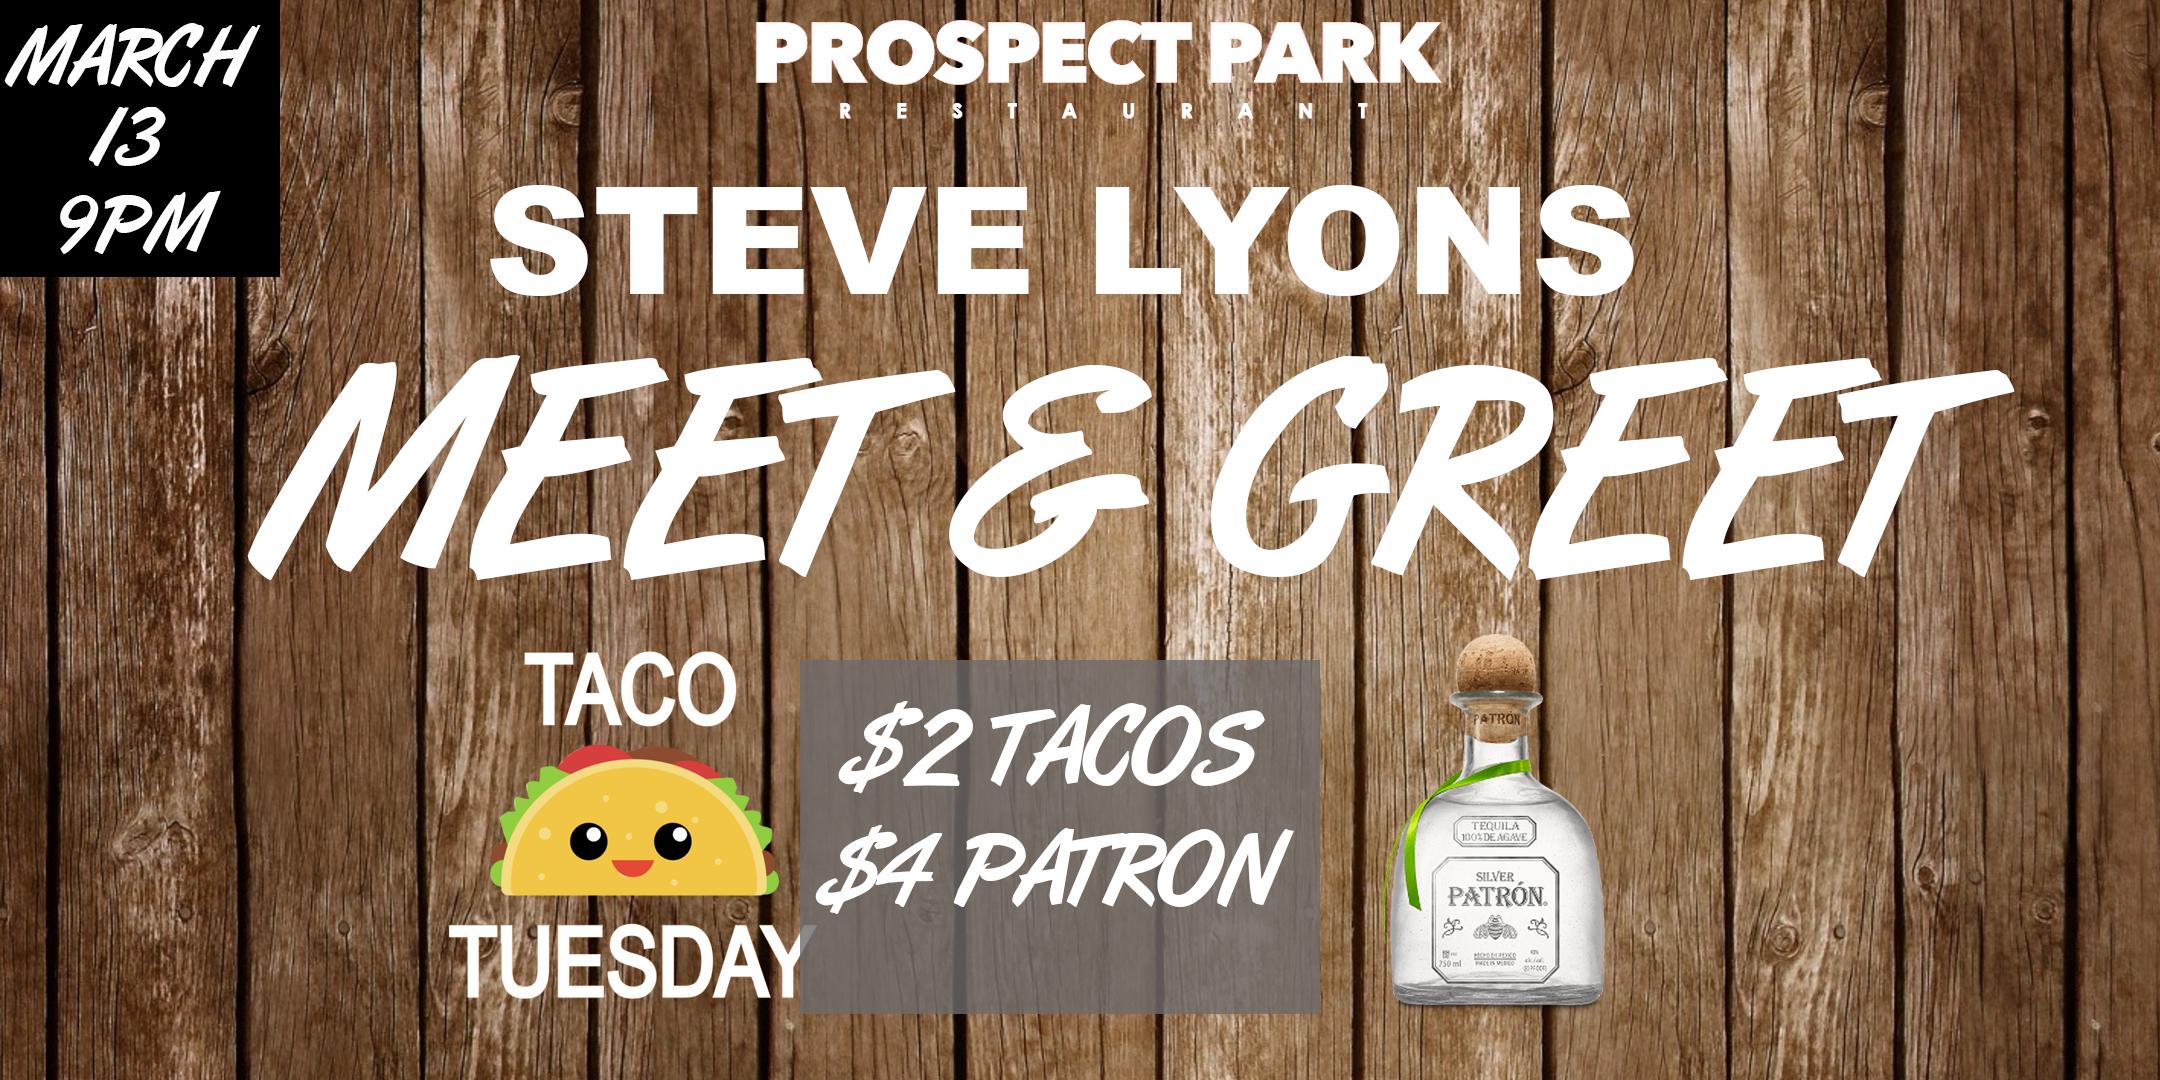 Steve lyons celebrity meet greet at prospect park 17 apr 2018 steve lyons celebrity meet greet at prospect park m4hsunfo